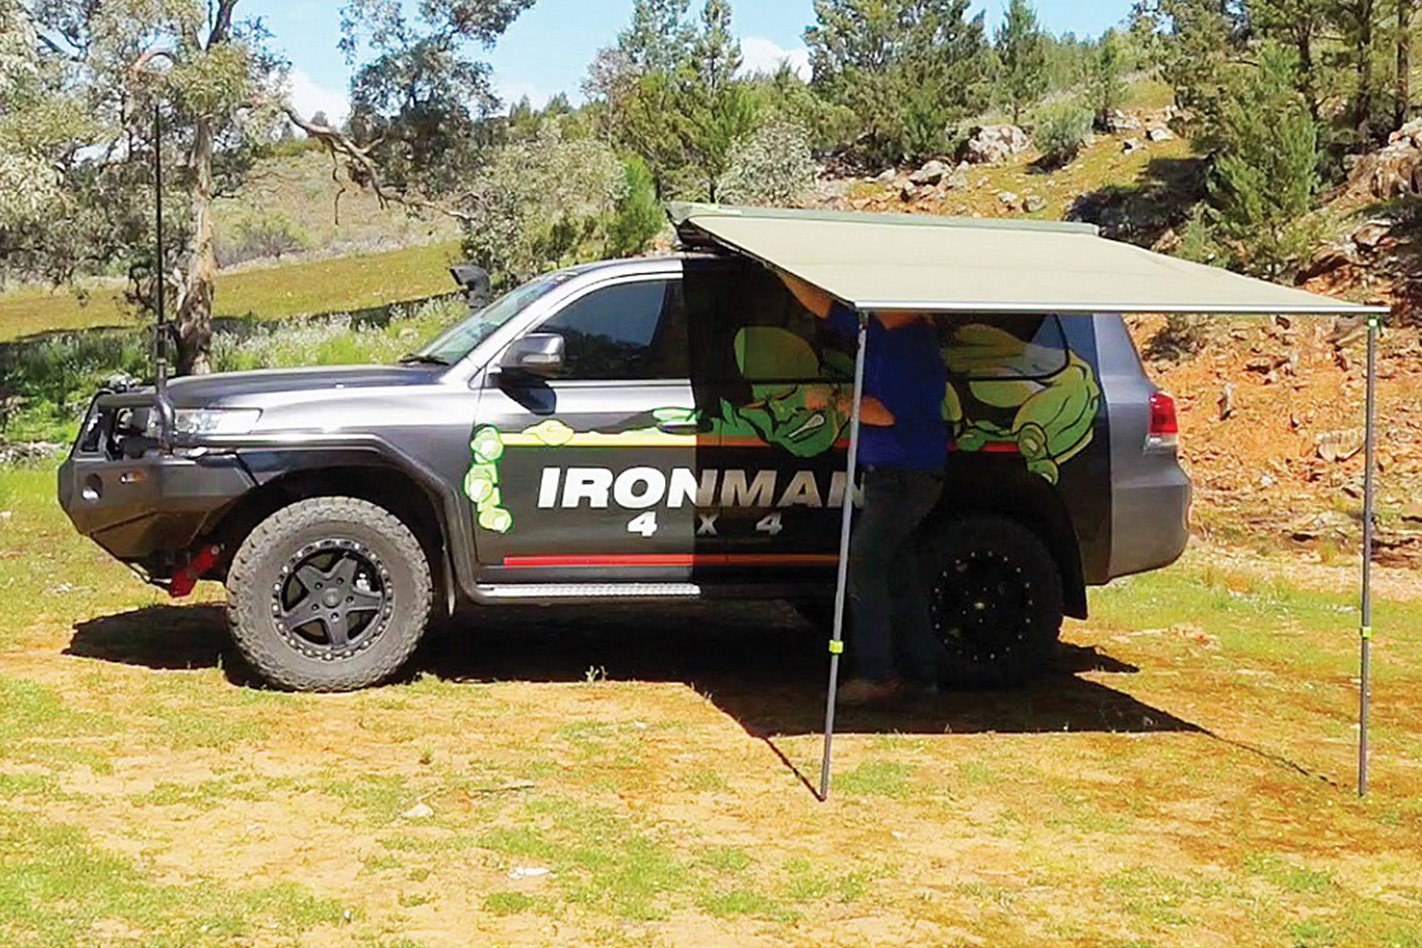 Ironman-4x4-Awning.jpg